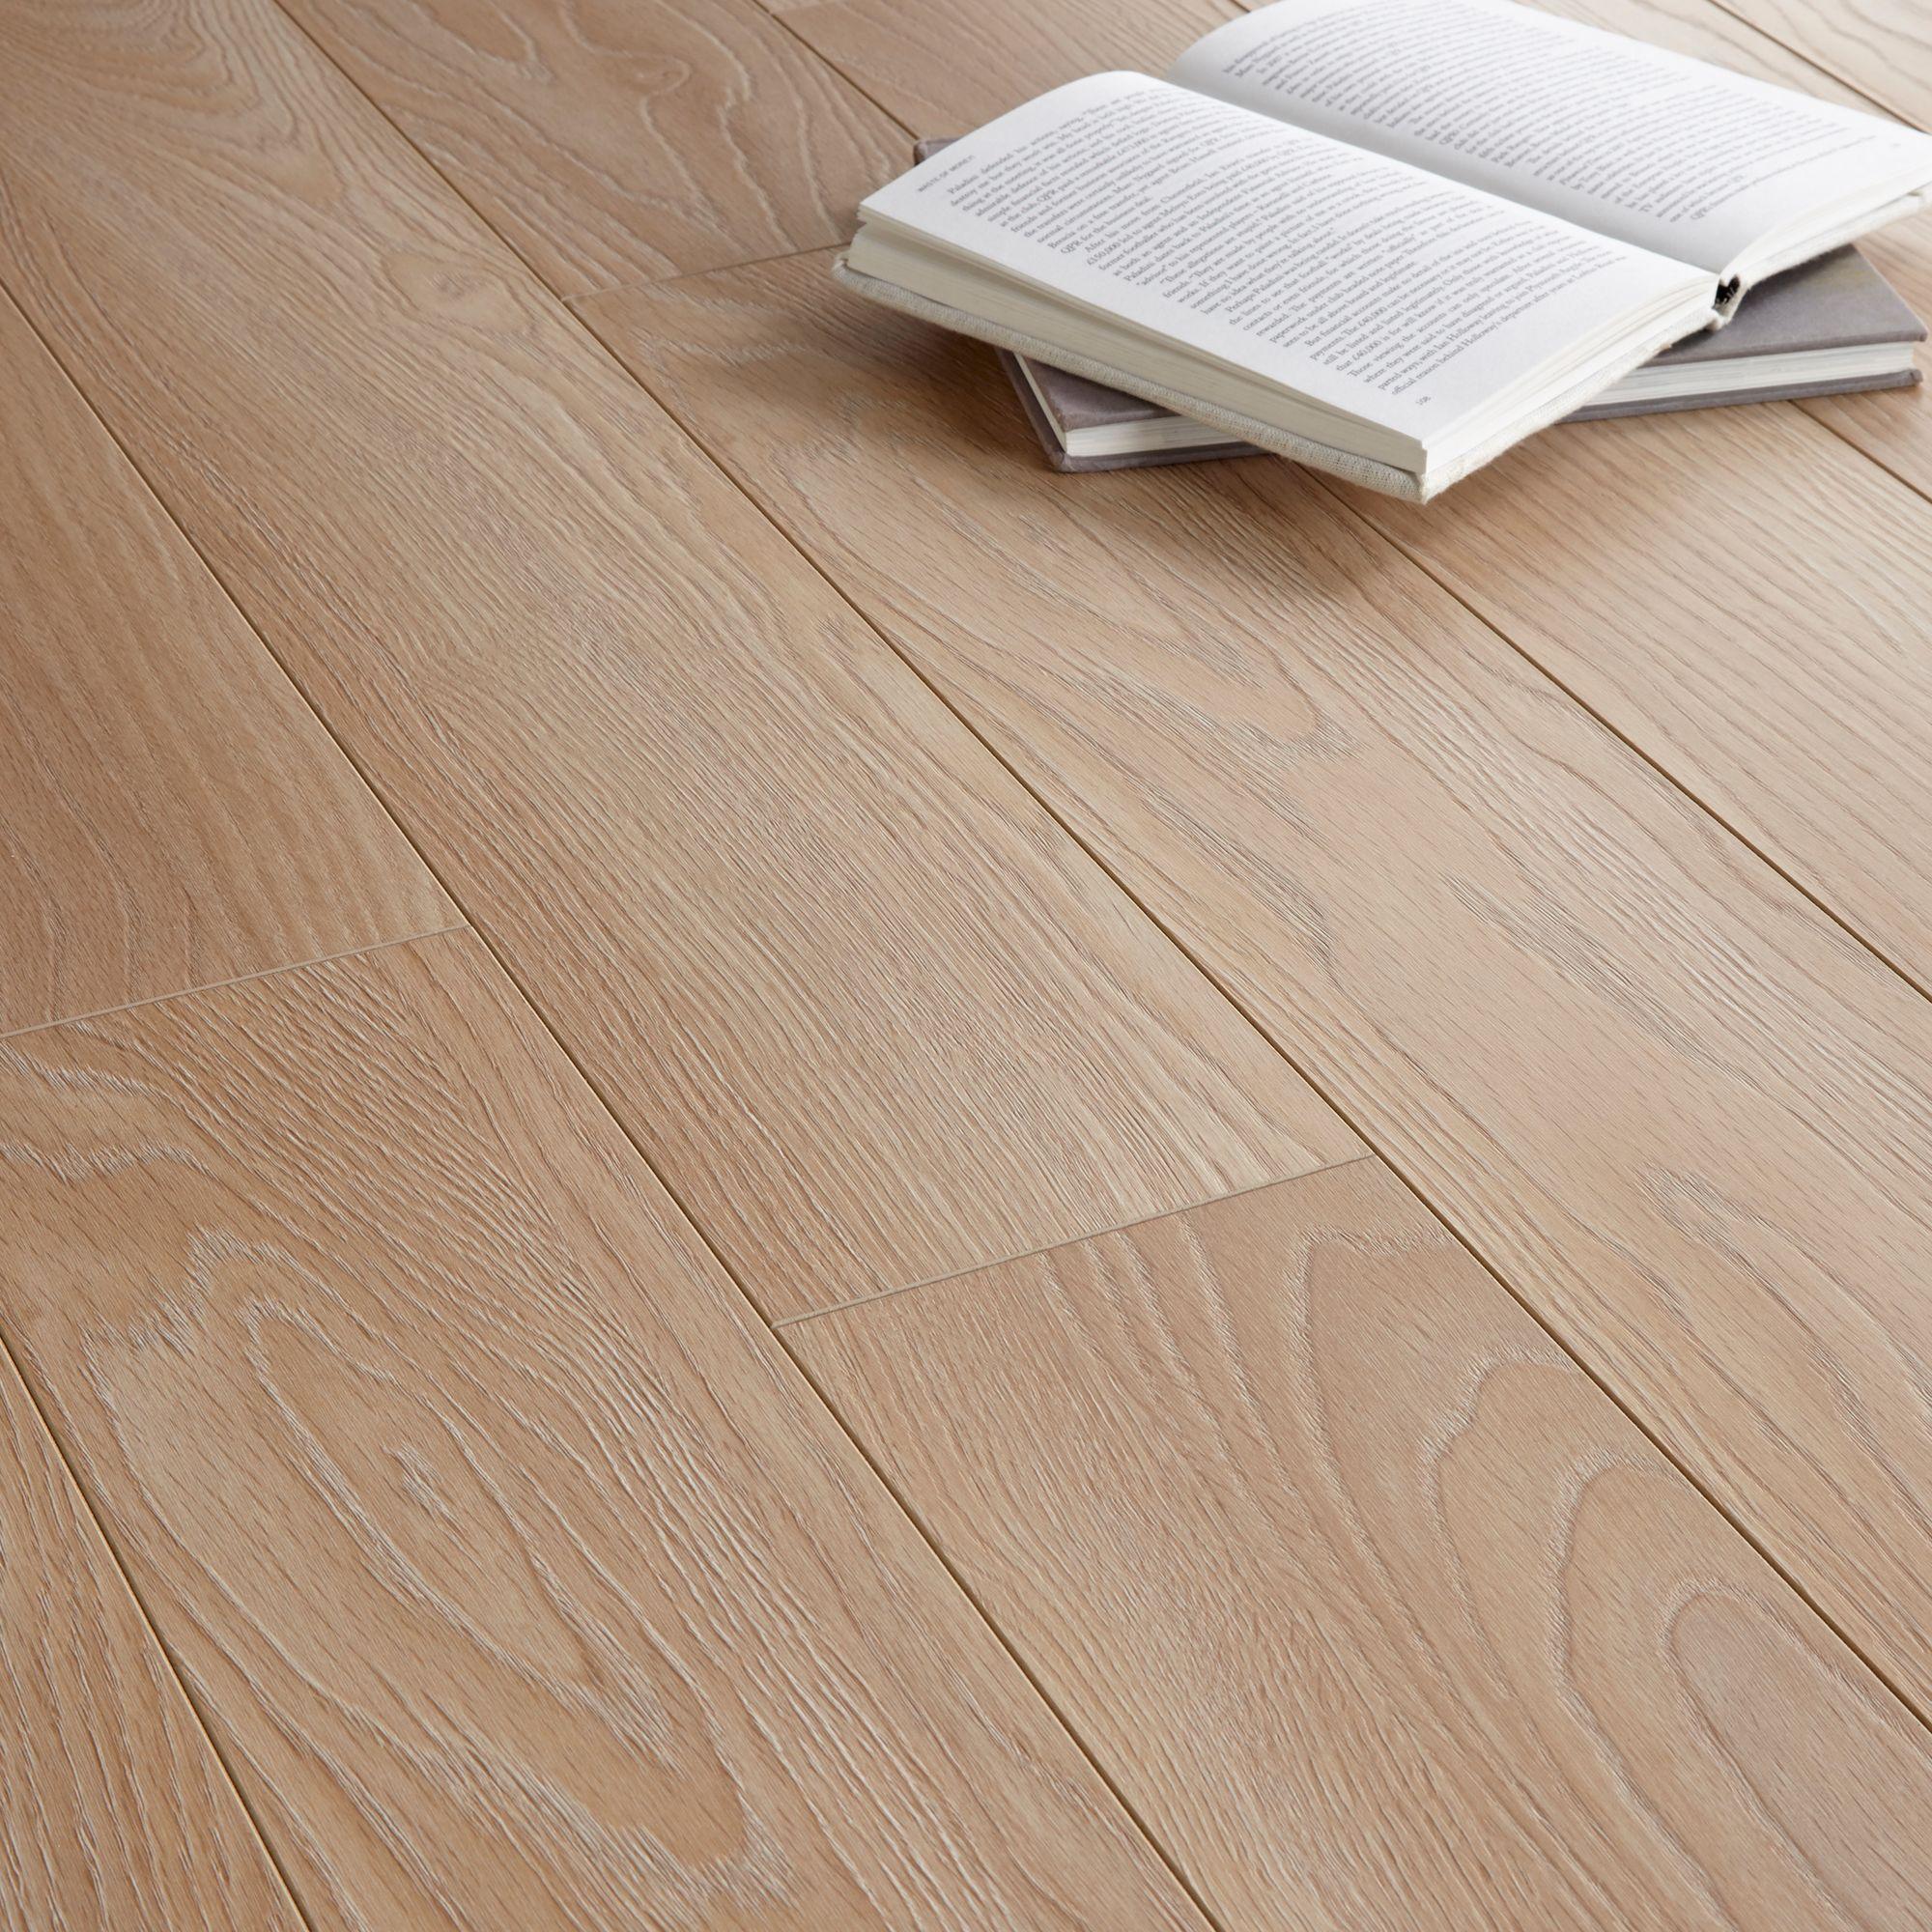 Colours Toccata Light Oak Effect Laminate Flooring 1 65m Pack Departments Diy At B Q Laminate Flooring Oak Laminate Flooring